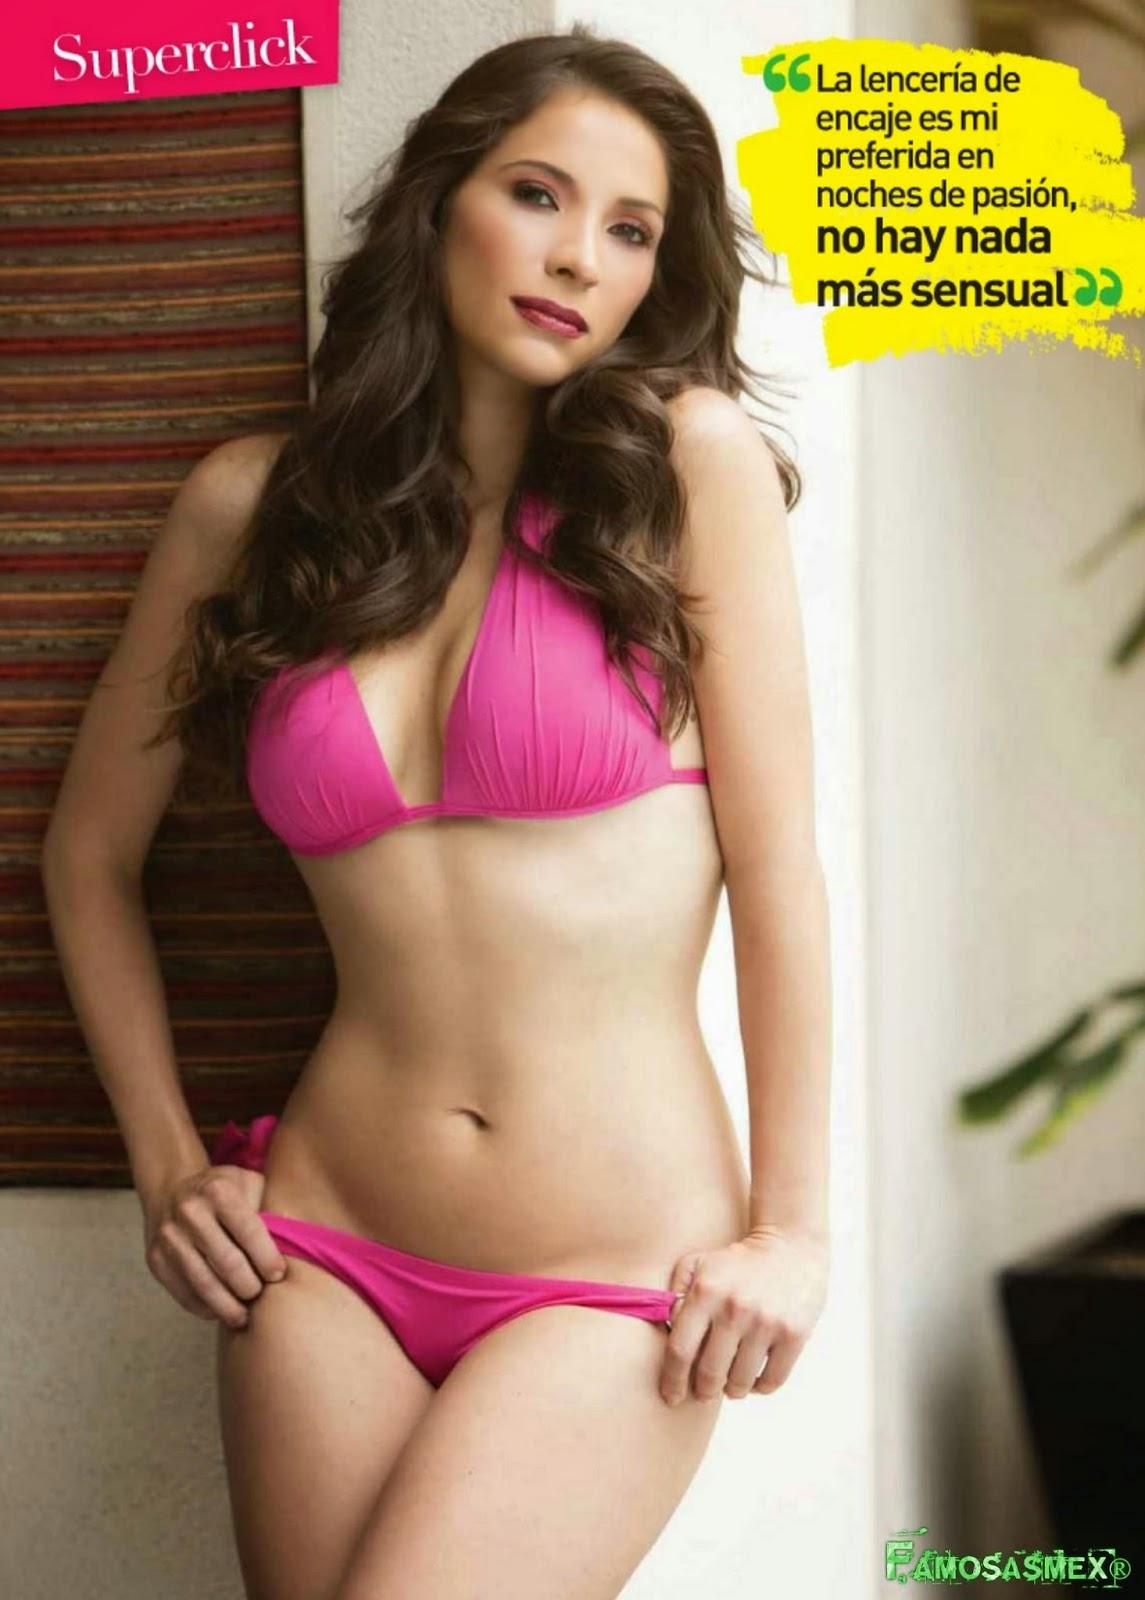 Adriana Cataño Para TvNotas x4 HQ | FamosasMex